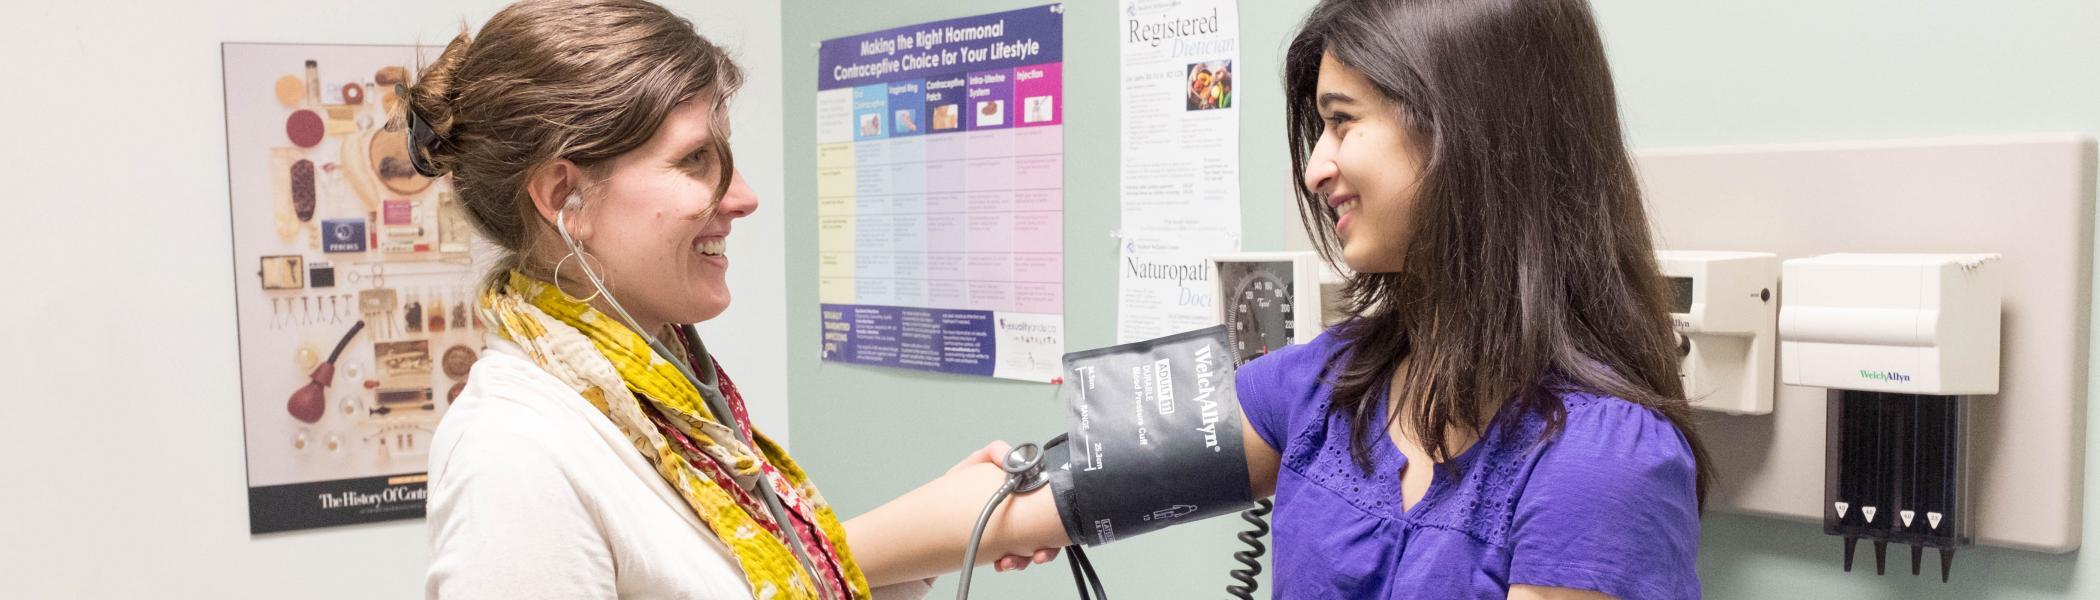 Student having blood pressure taken by nurse